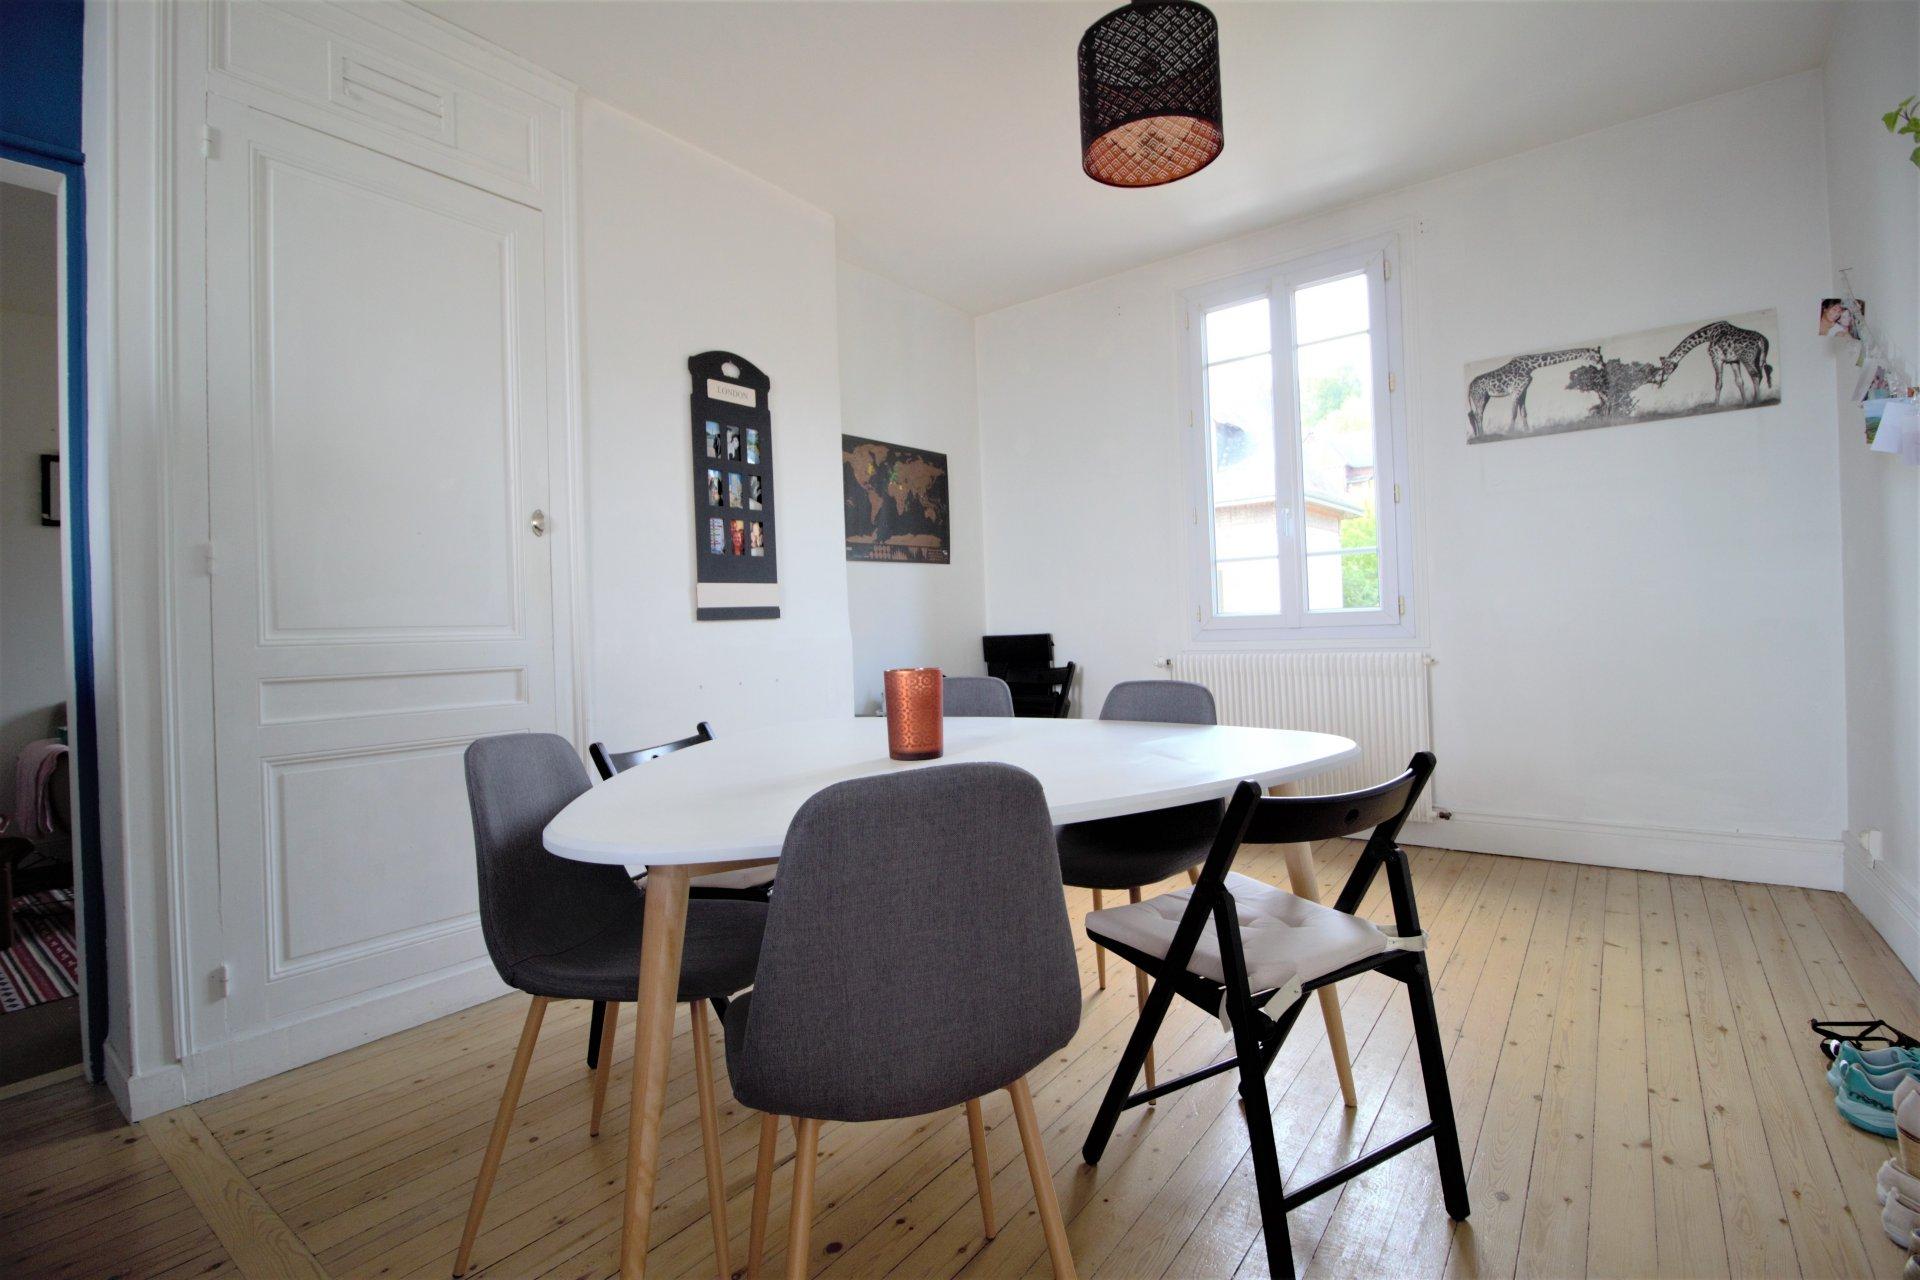 Location Appartement - Rouen